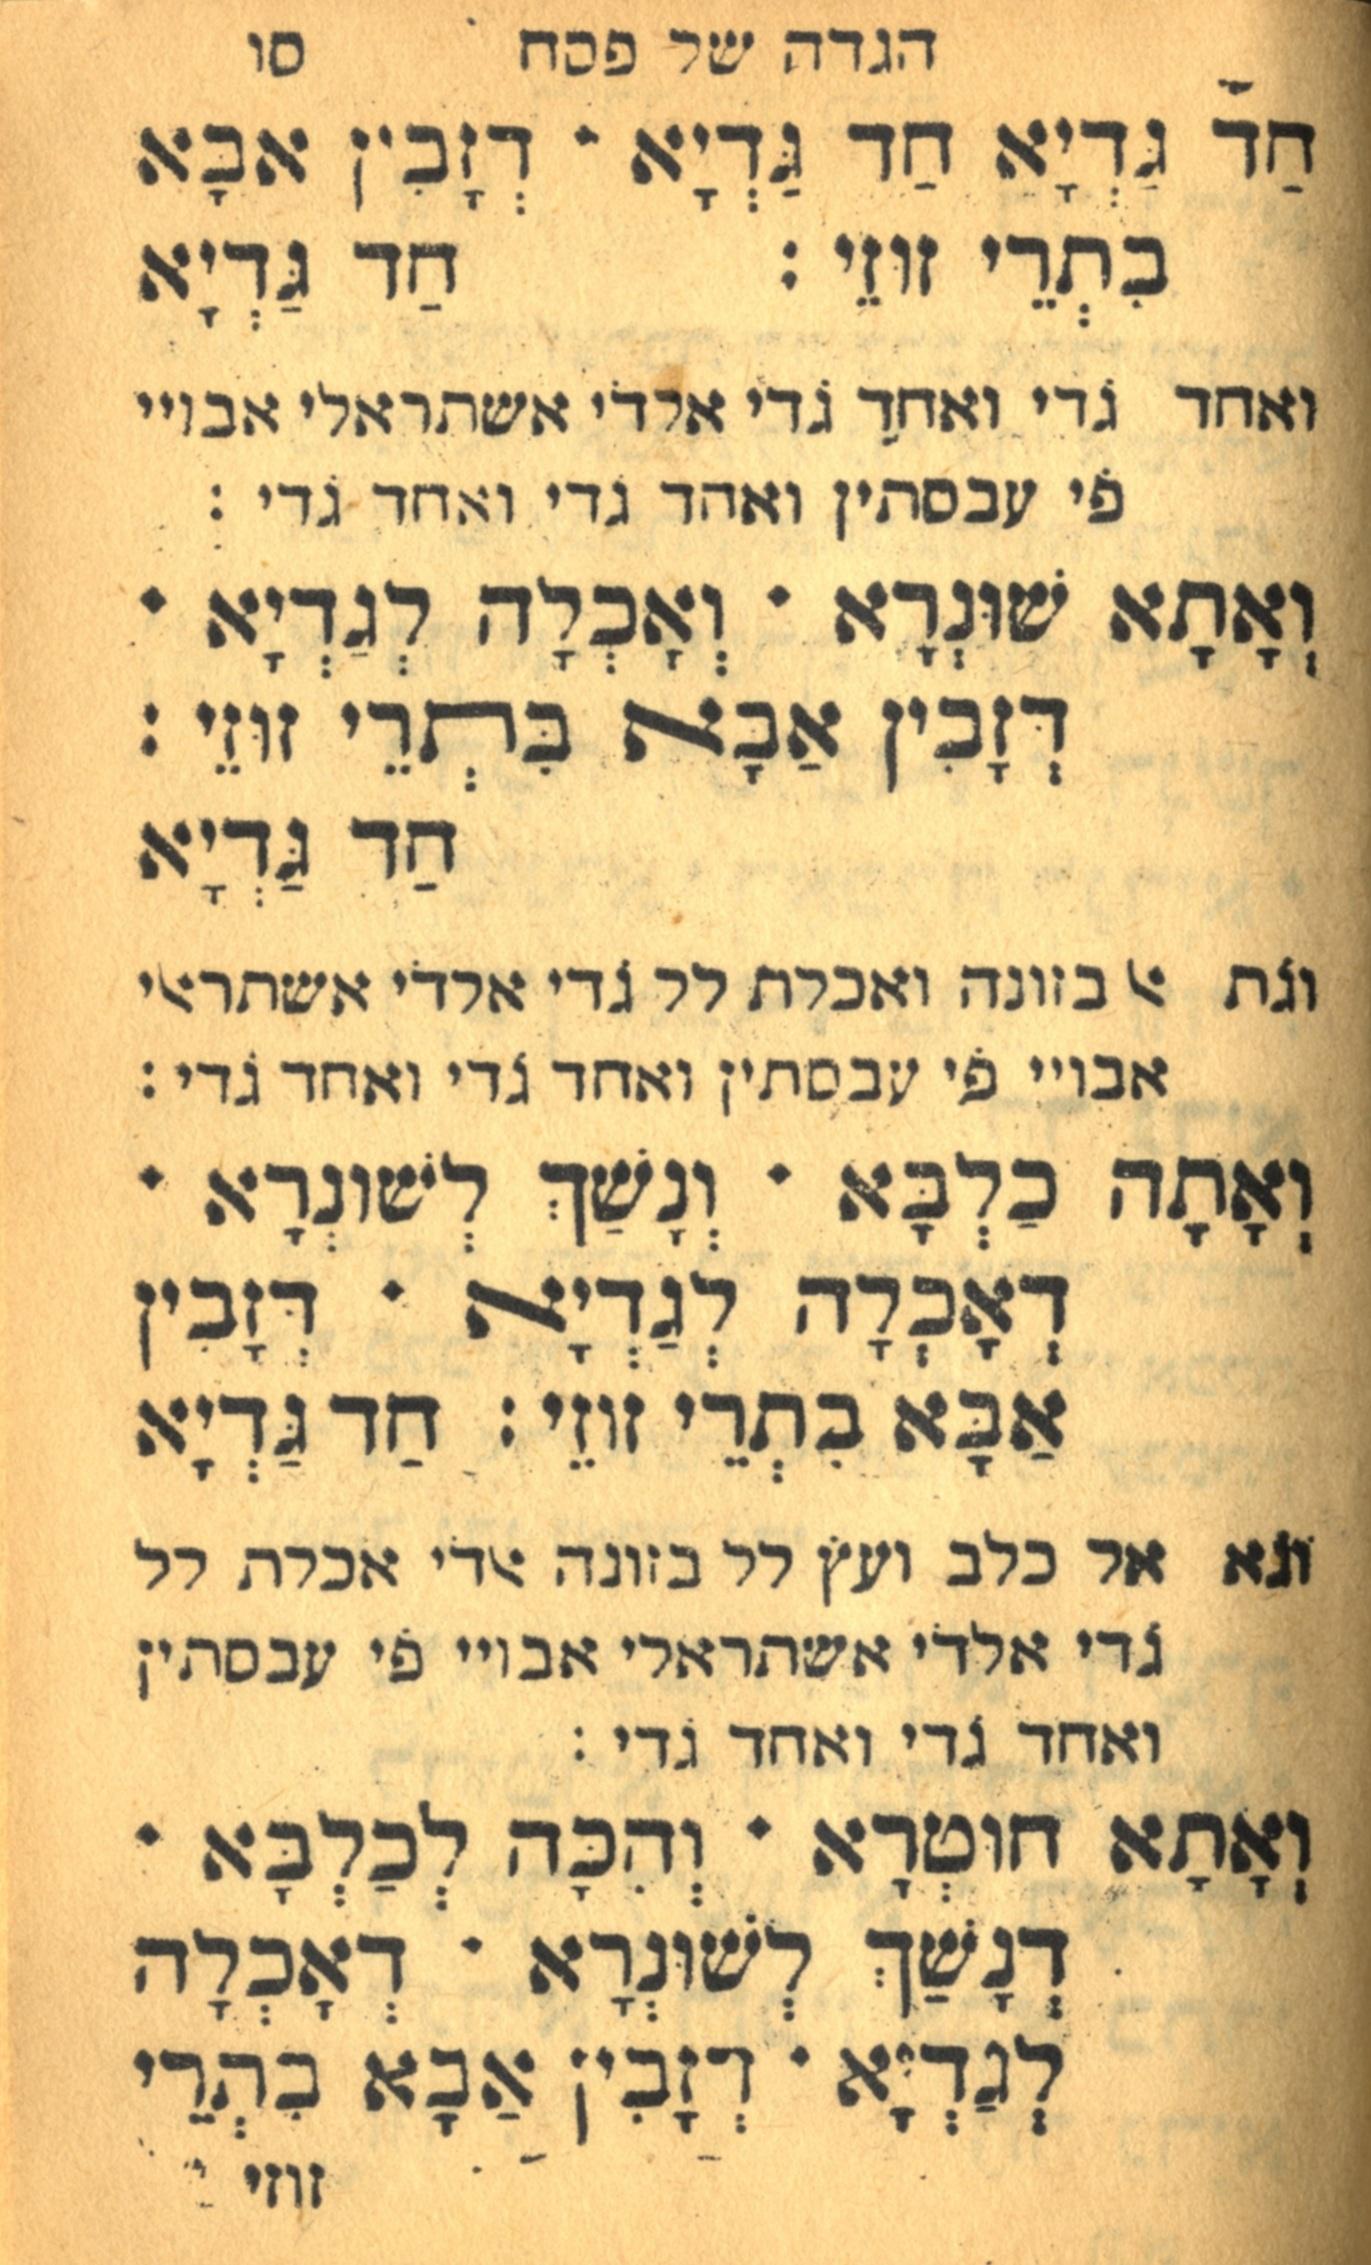 Judeo-Arabic-version-of-Had-Gadya-from-Belforte